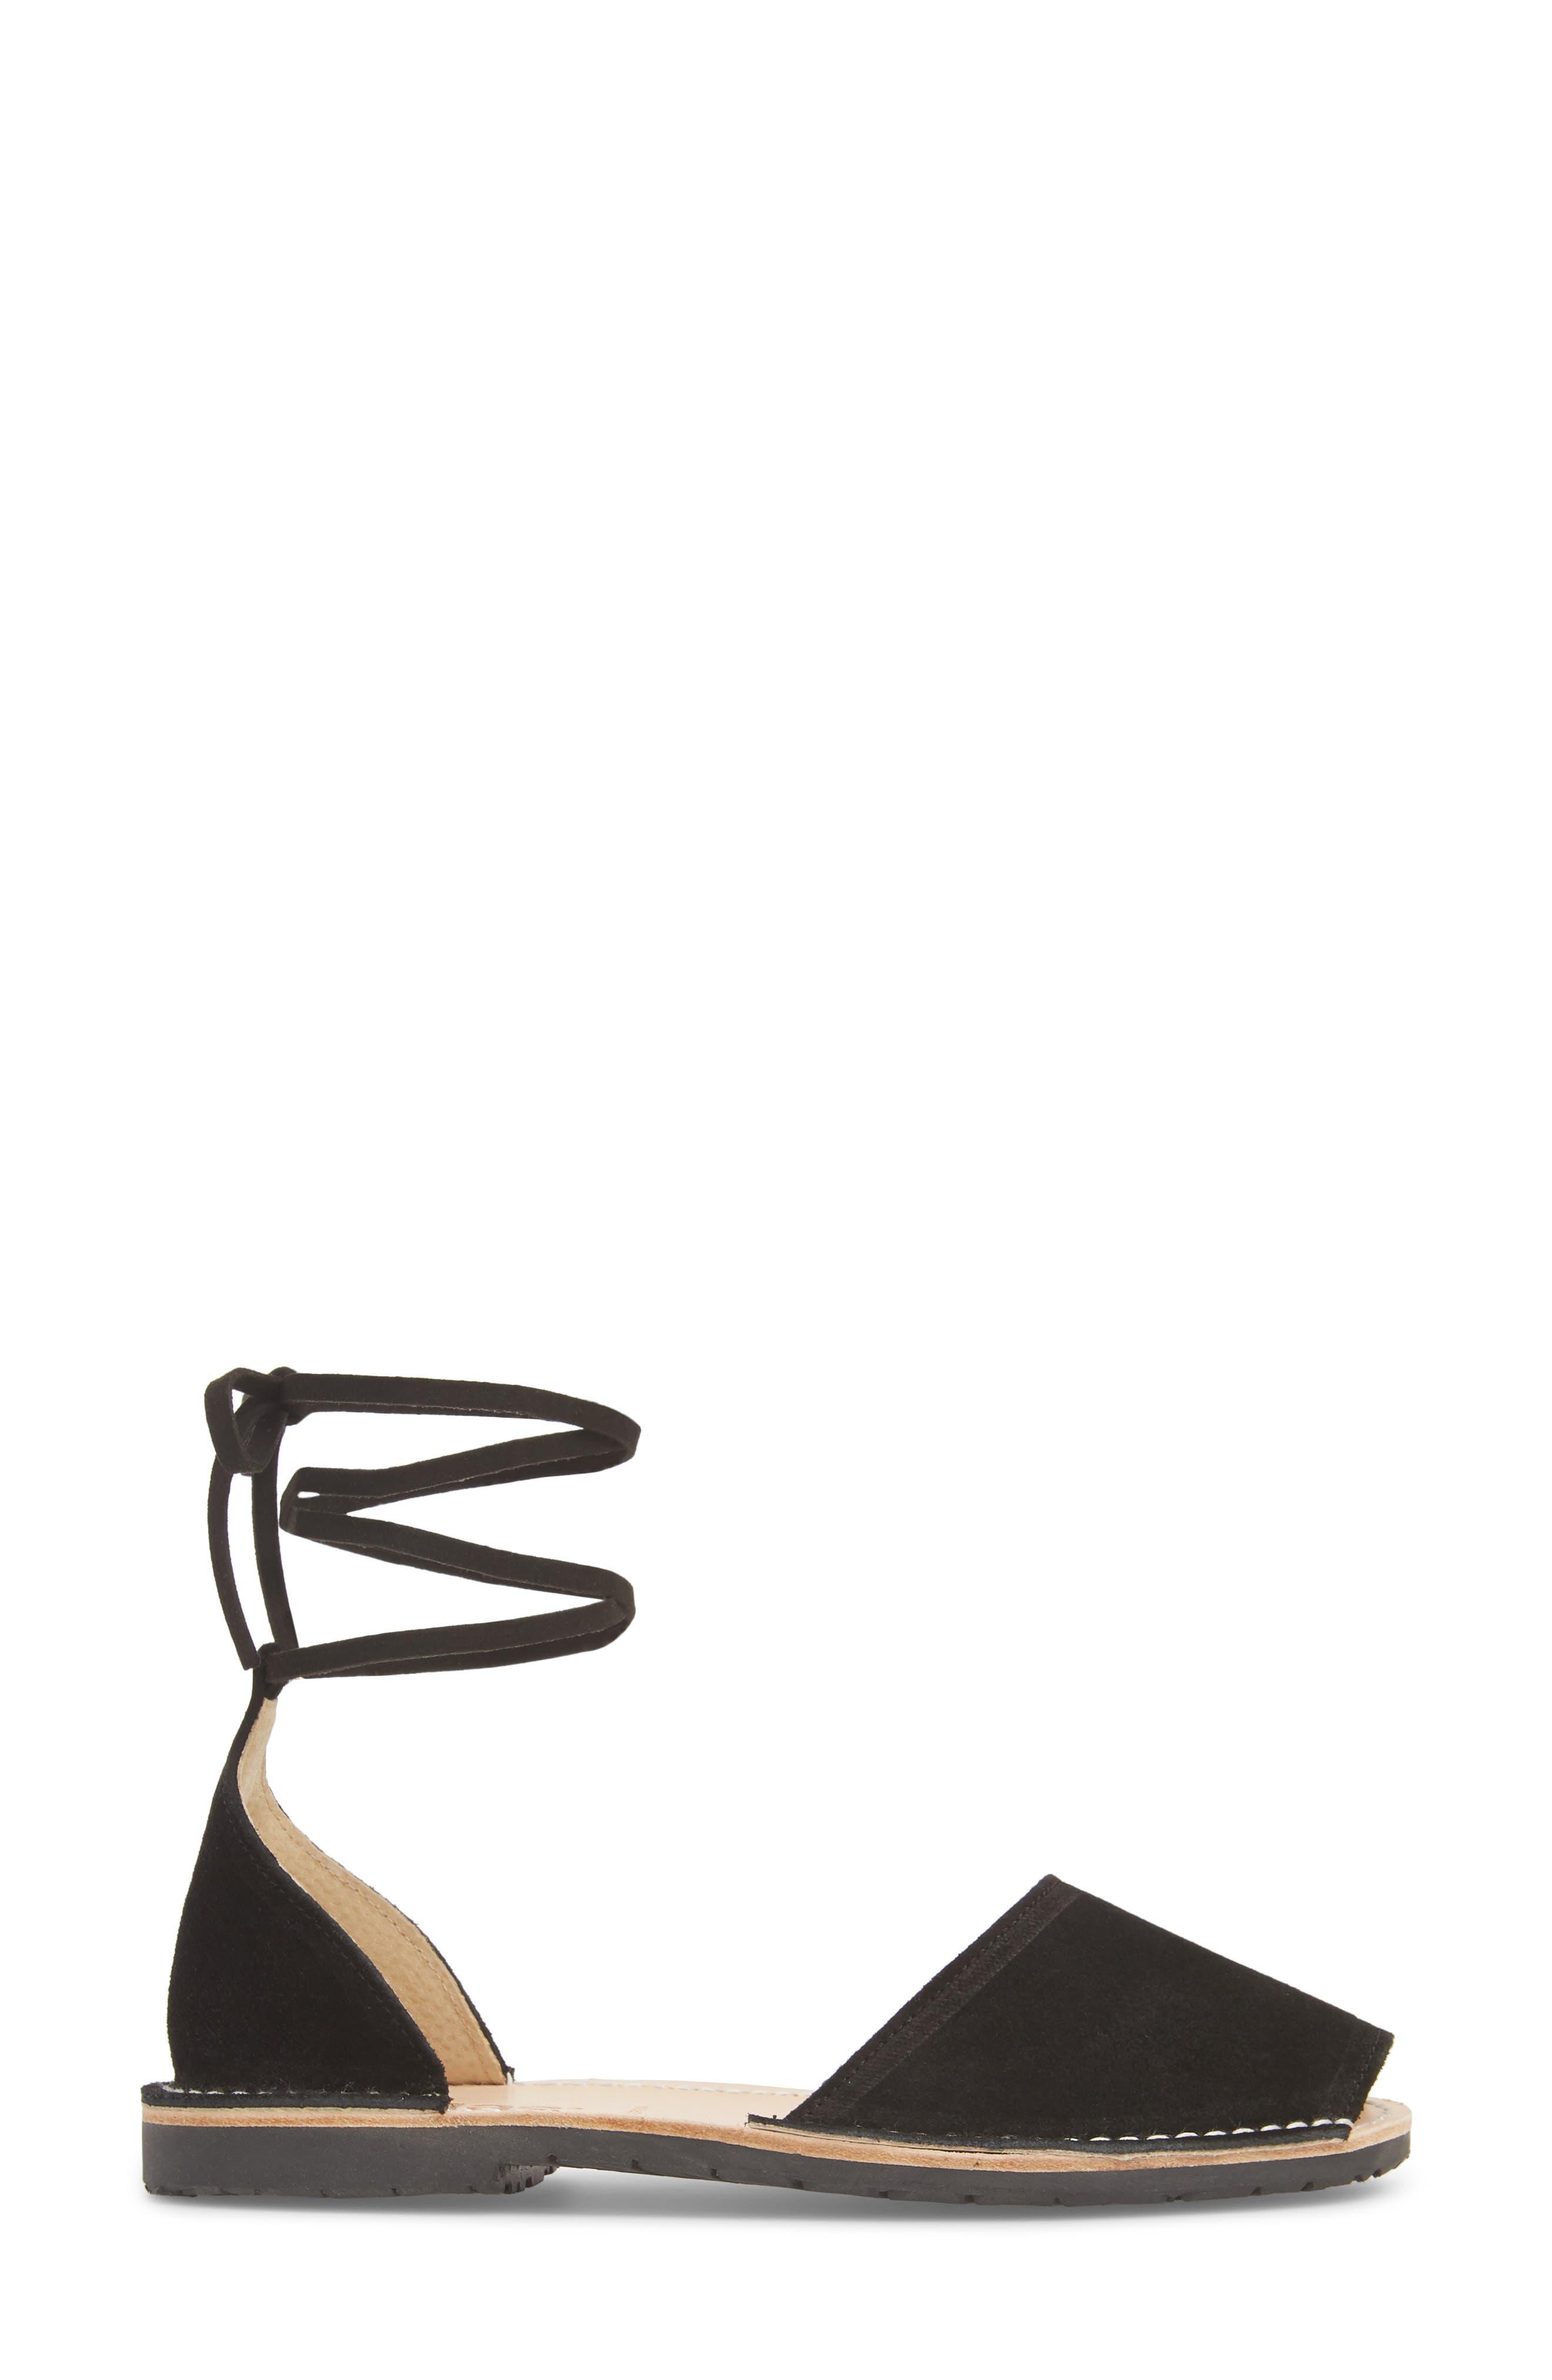 Ankle Tie Sandal,                             Alternate thumbnail 3, color,                             BLACK